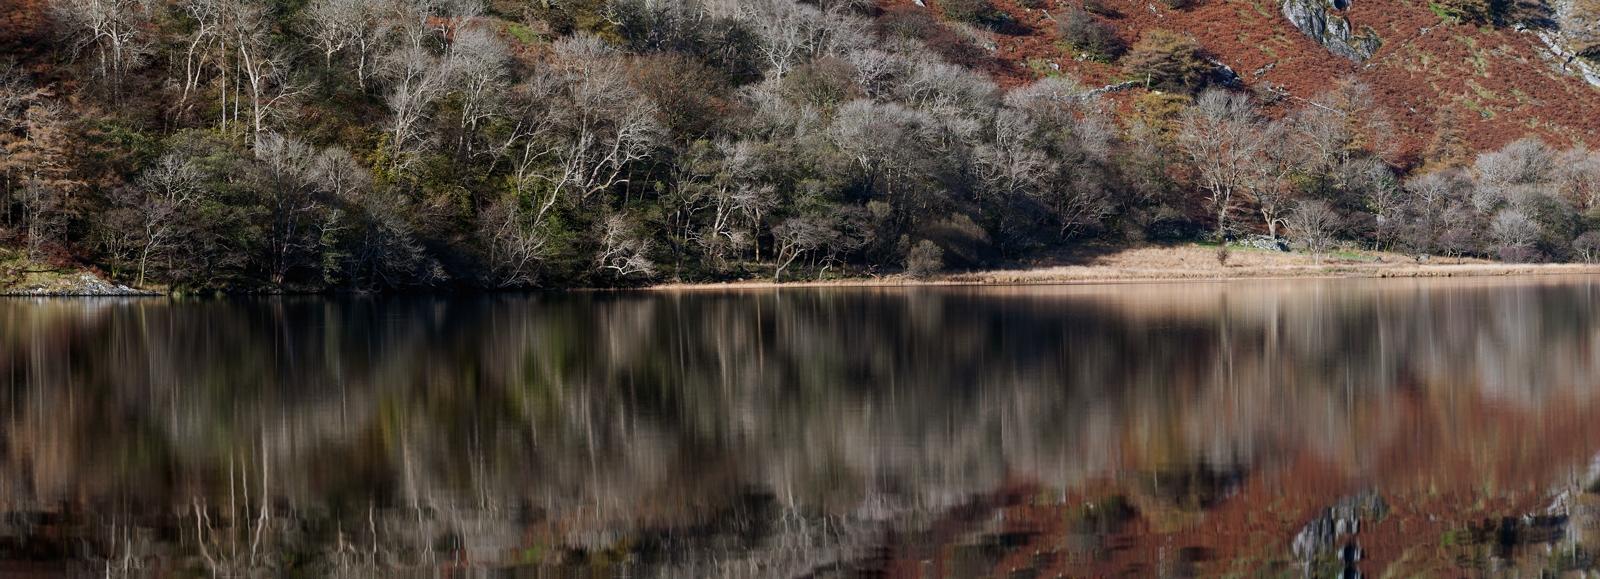 Buy canvas prints of llyn gwynant snowdonia north wales for Buy canvas prints online